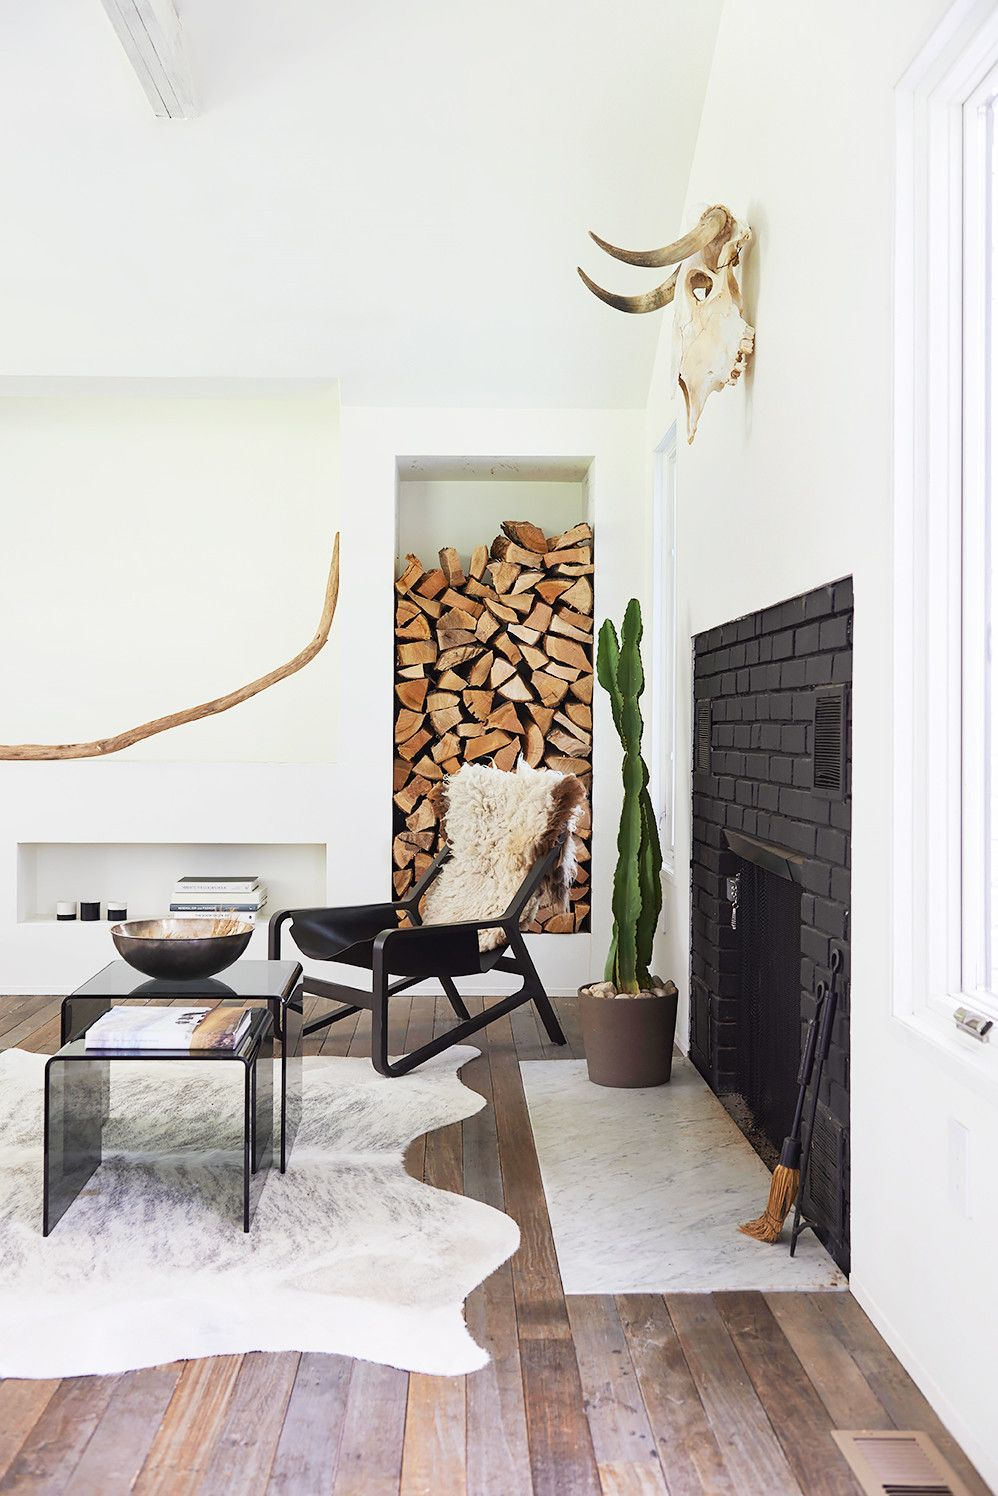 15 Best Scandinavian Tips To Create A Cozy Home Living Room Scandinavian Cozy House Scandinavian Design Living Room